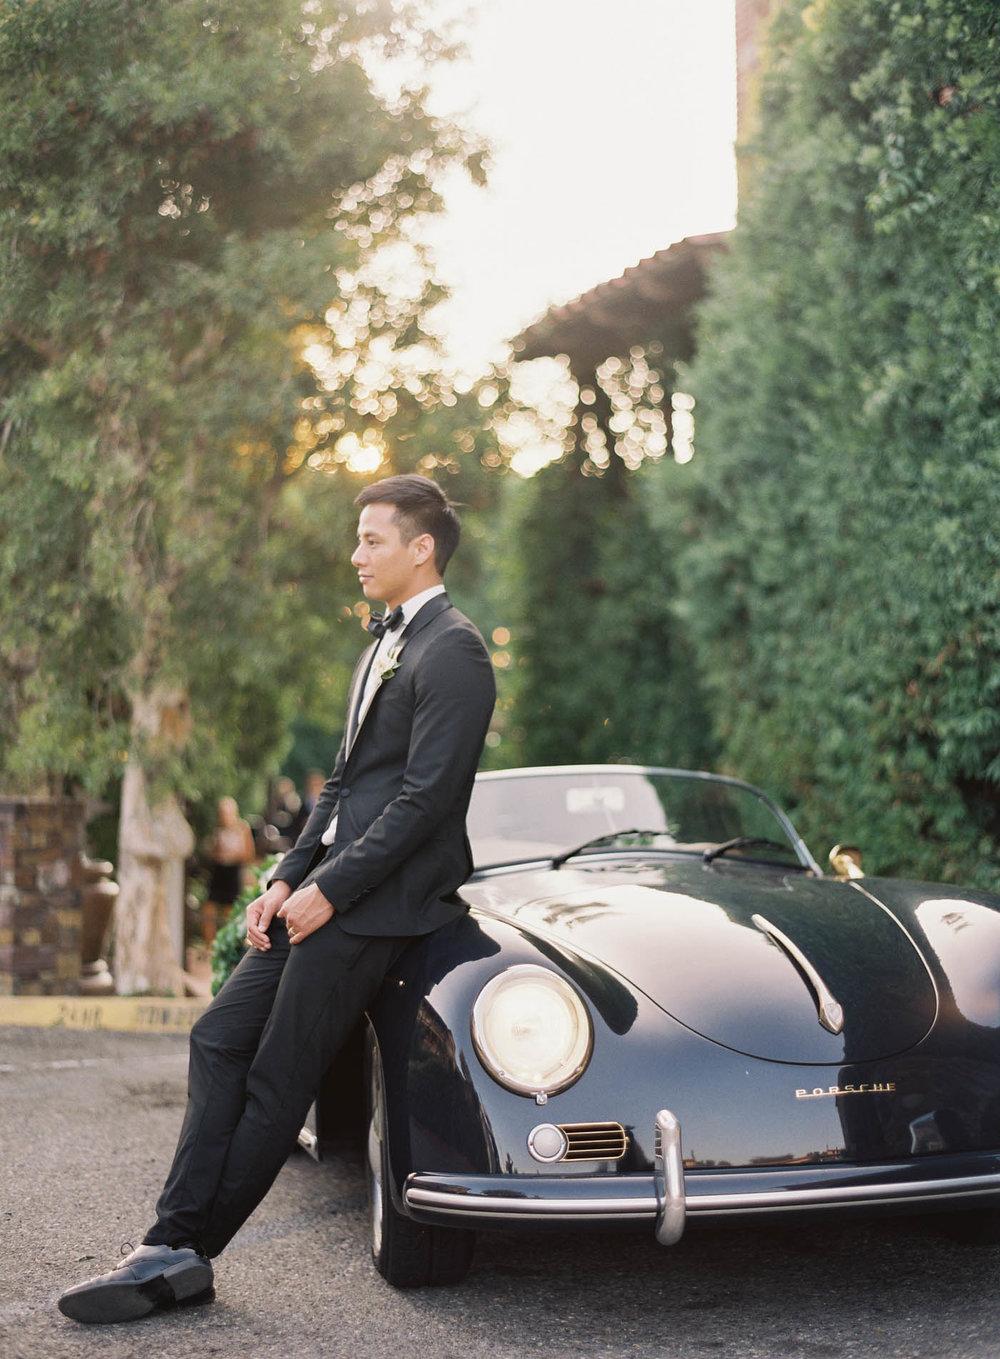 franciscan-gardens-wedding-26-Jen_Huang-000753-R1-007.jpg